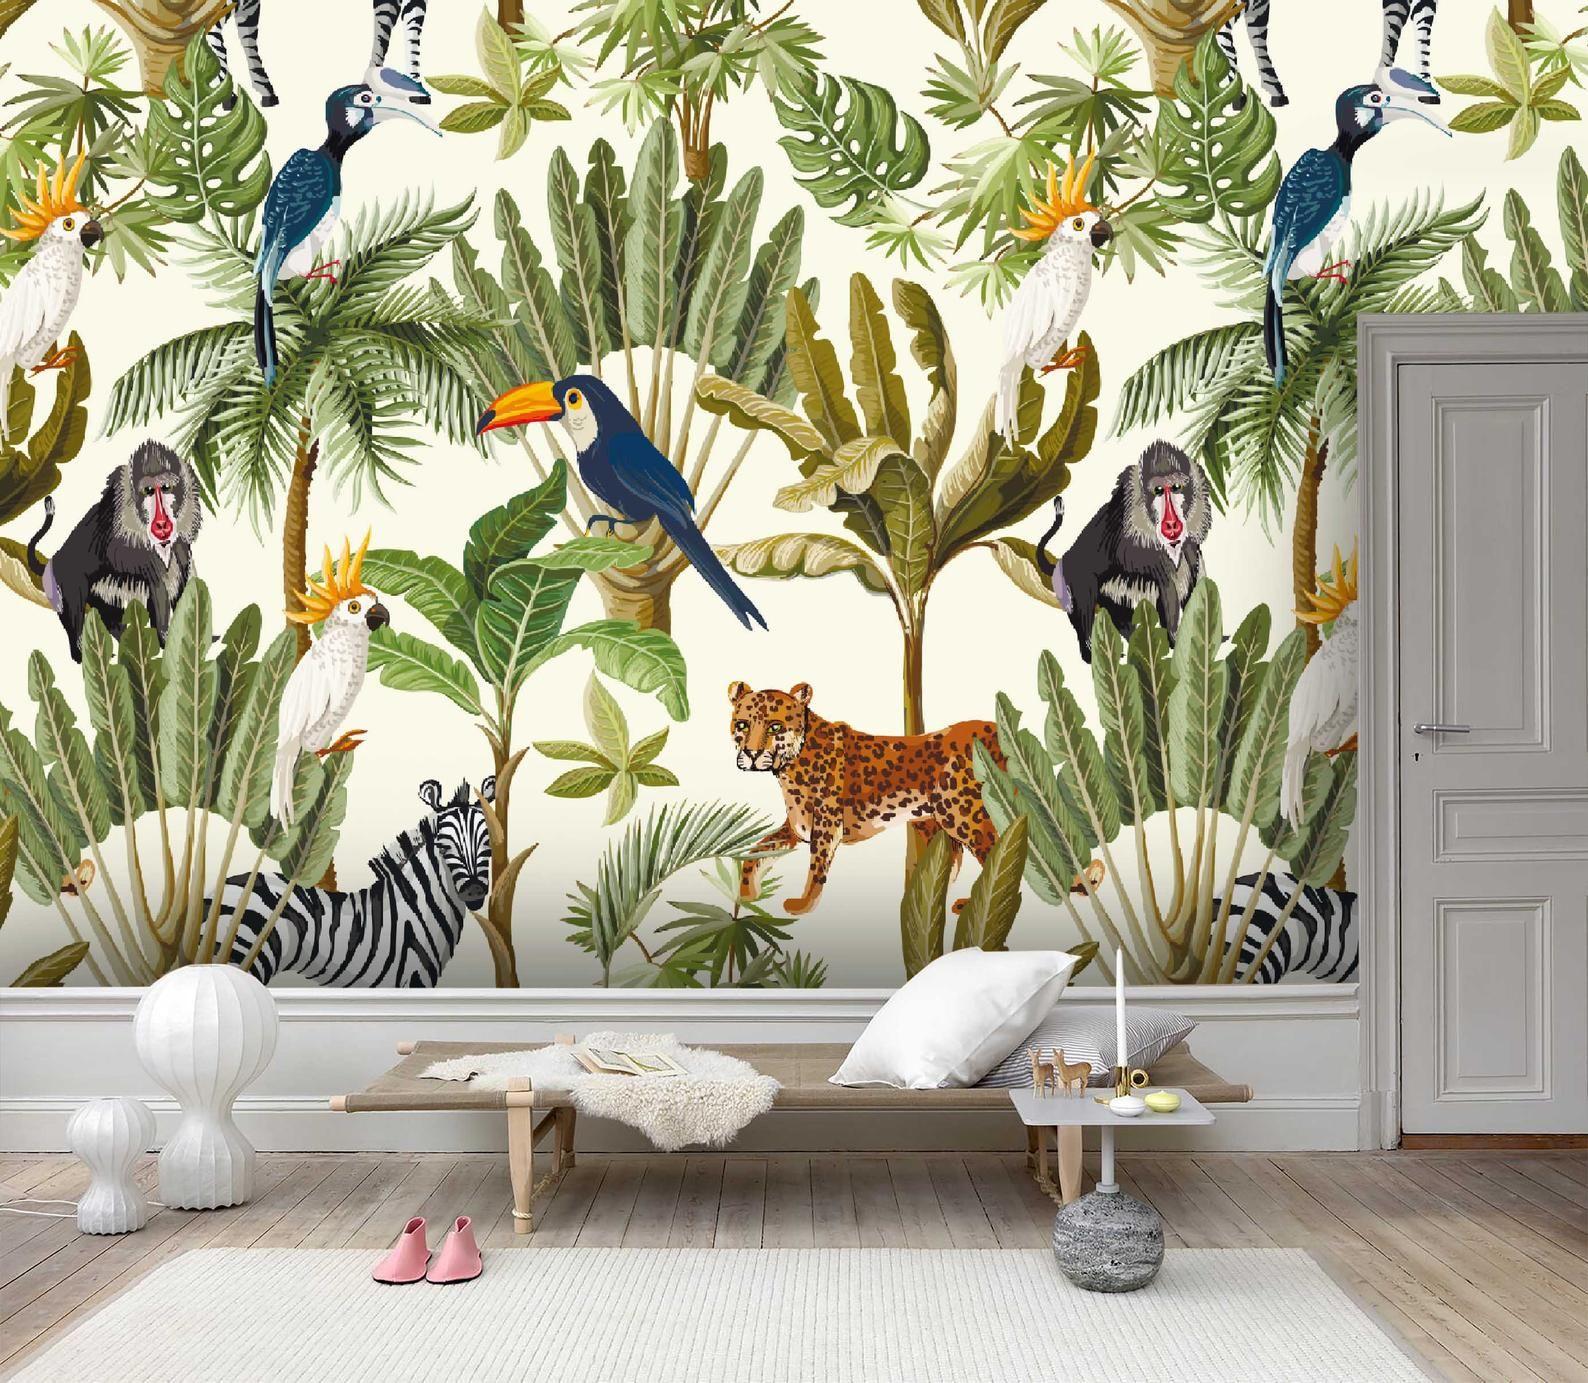 3d Tropical Jungle Toucan Wallpaper Mural Peel And Stick Etsy Wallpaper Mural Wallpaper Tropical Wall Decals